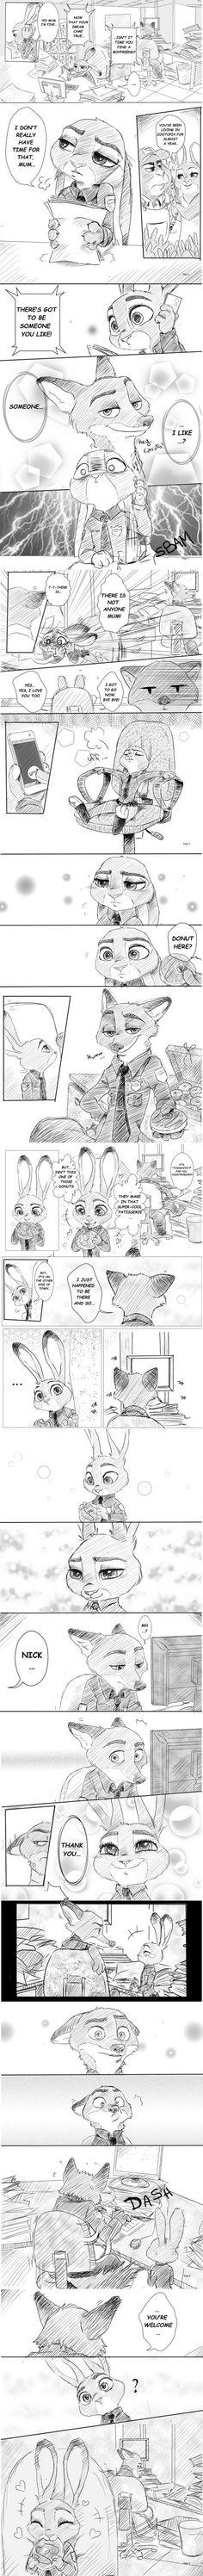 Boyfriend & Donut - Zootopia comic by Rem289